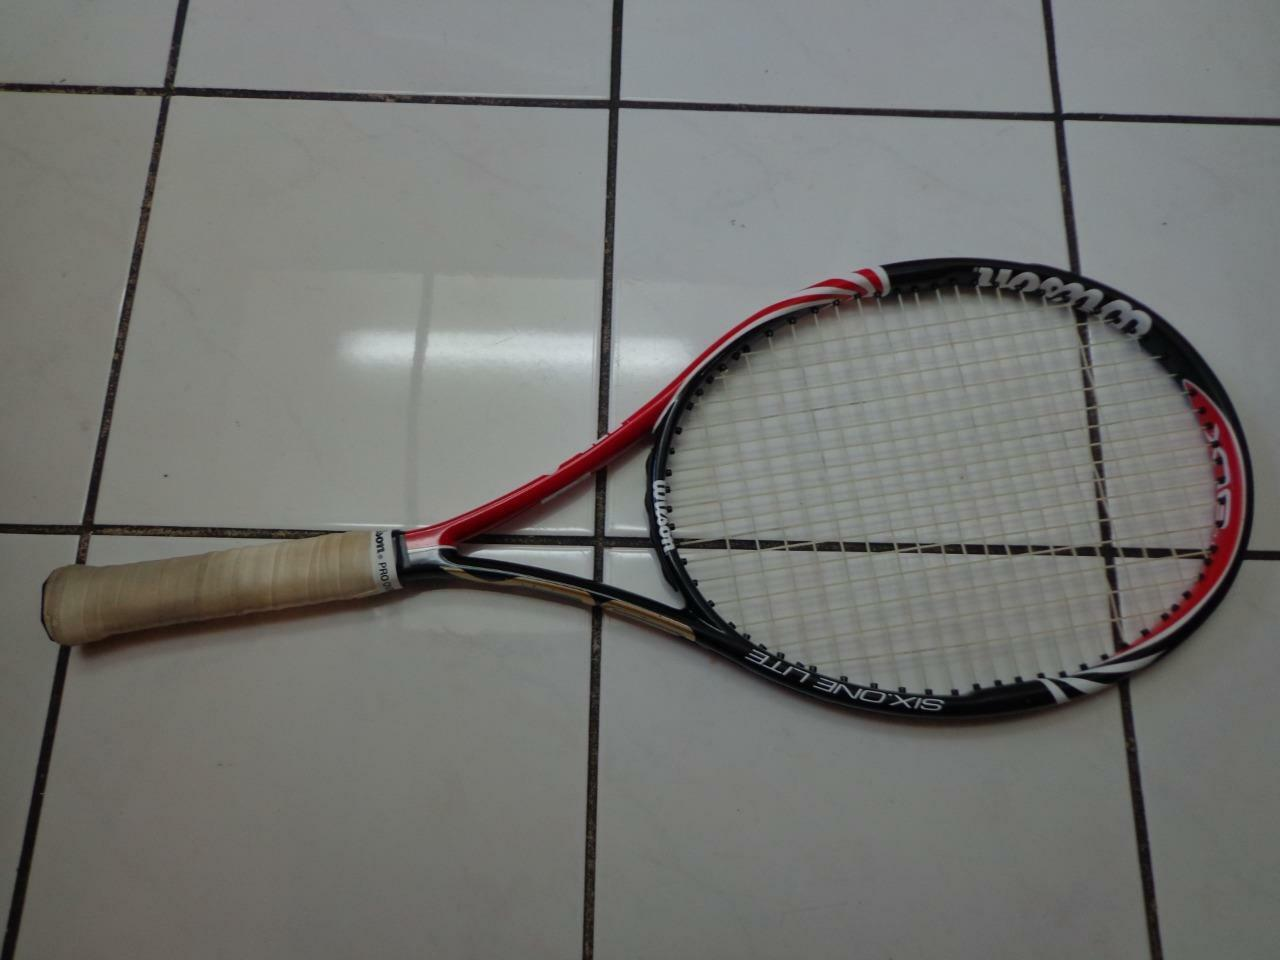 Wilson Blx seis uno 102 Lite 8.8 OZ (approx. 249.47 g) 4 1 4 Grip Tenis Raqueta